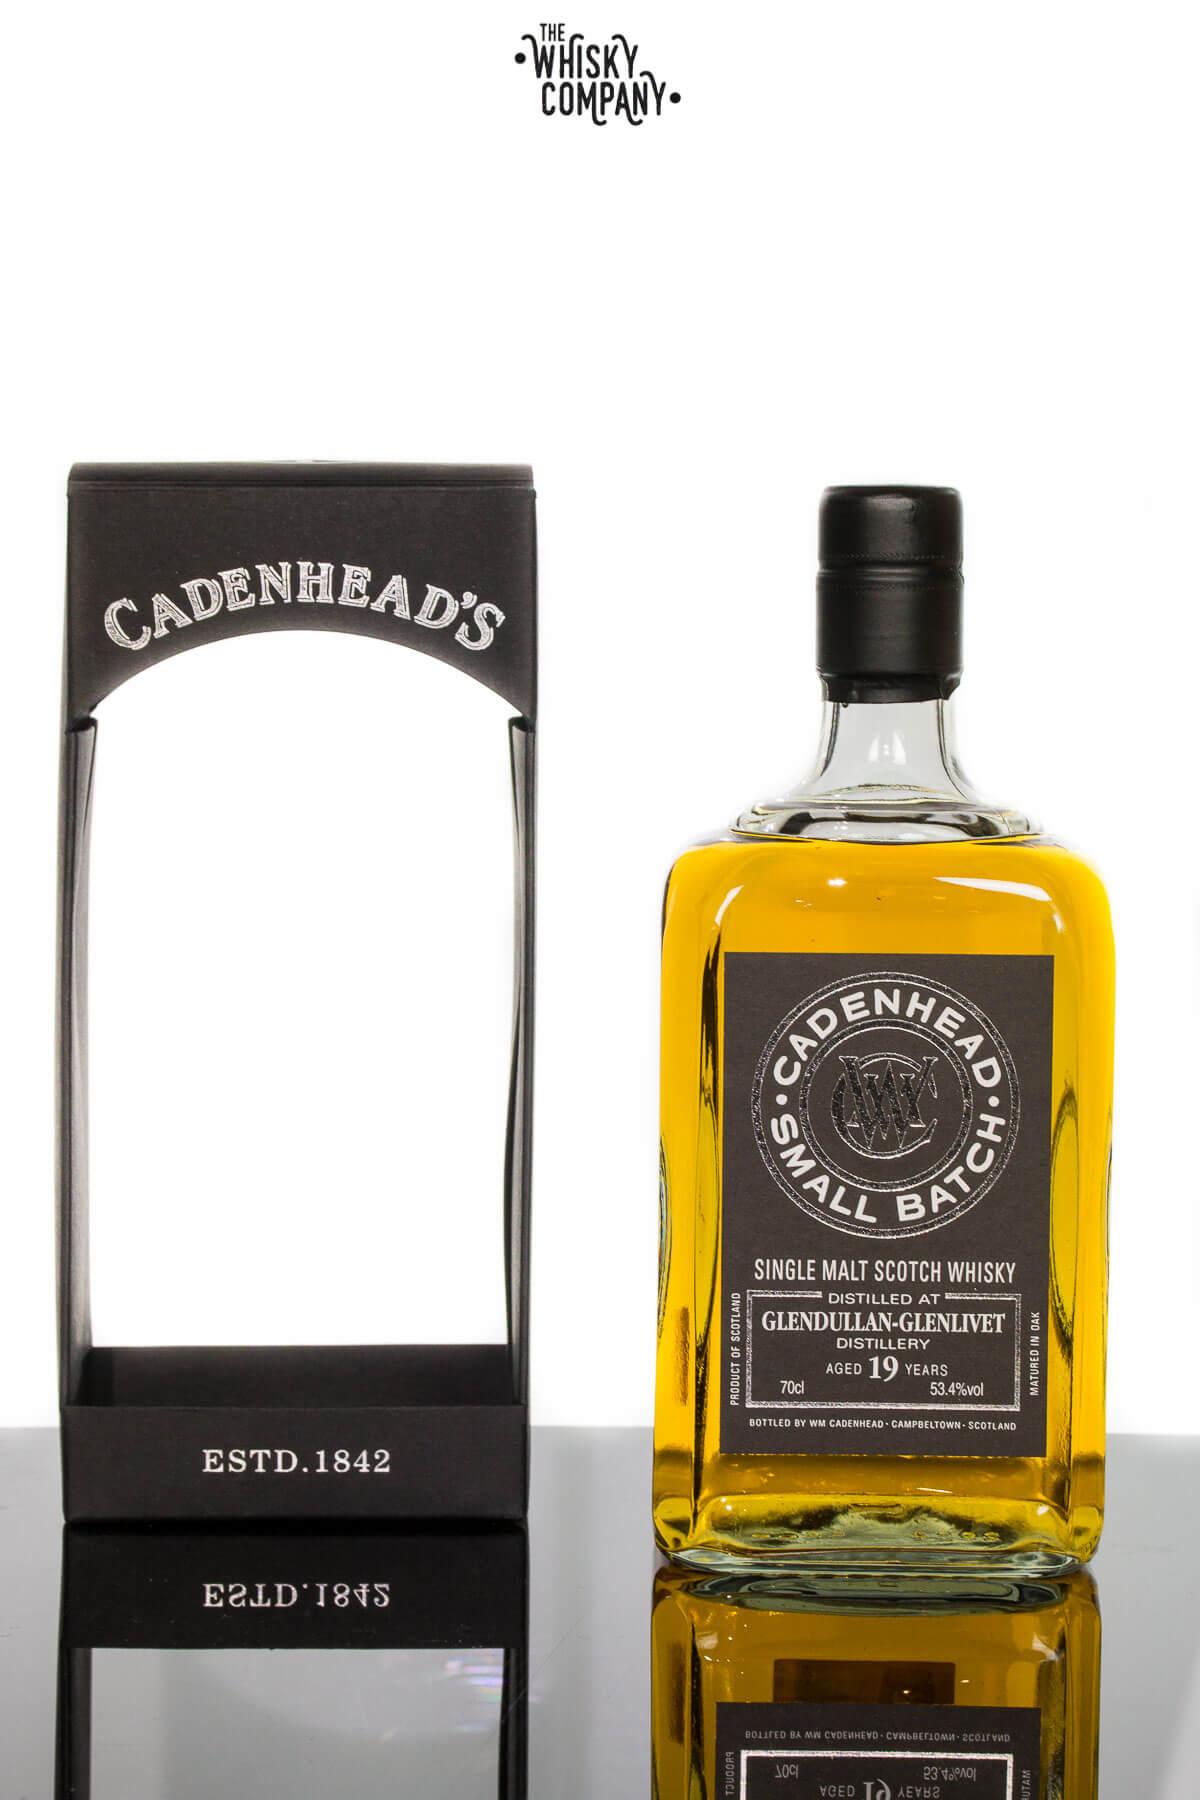 Cadenhead 1996 Glendullan-Glenlivet Aged 19 Years Single Malt Scotch Whisky 700ml